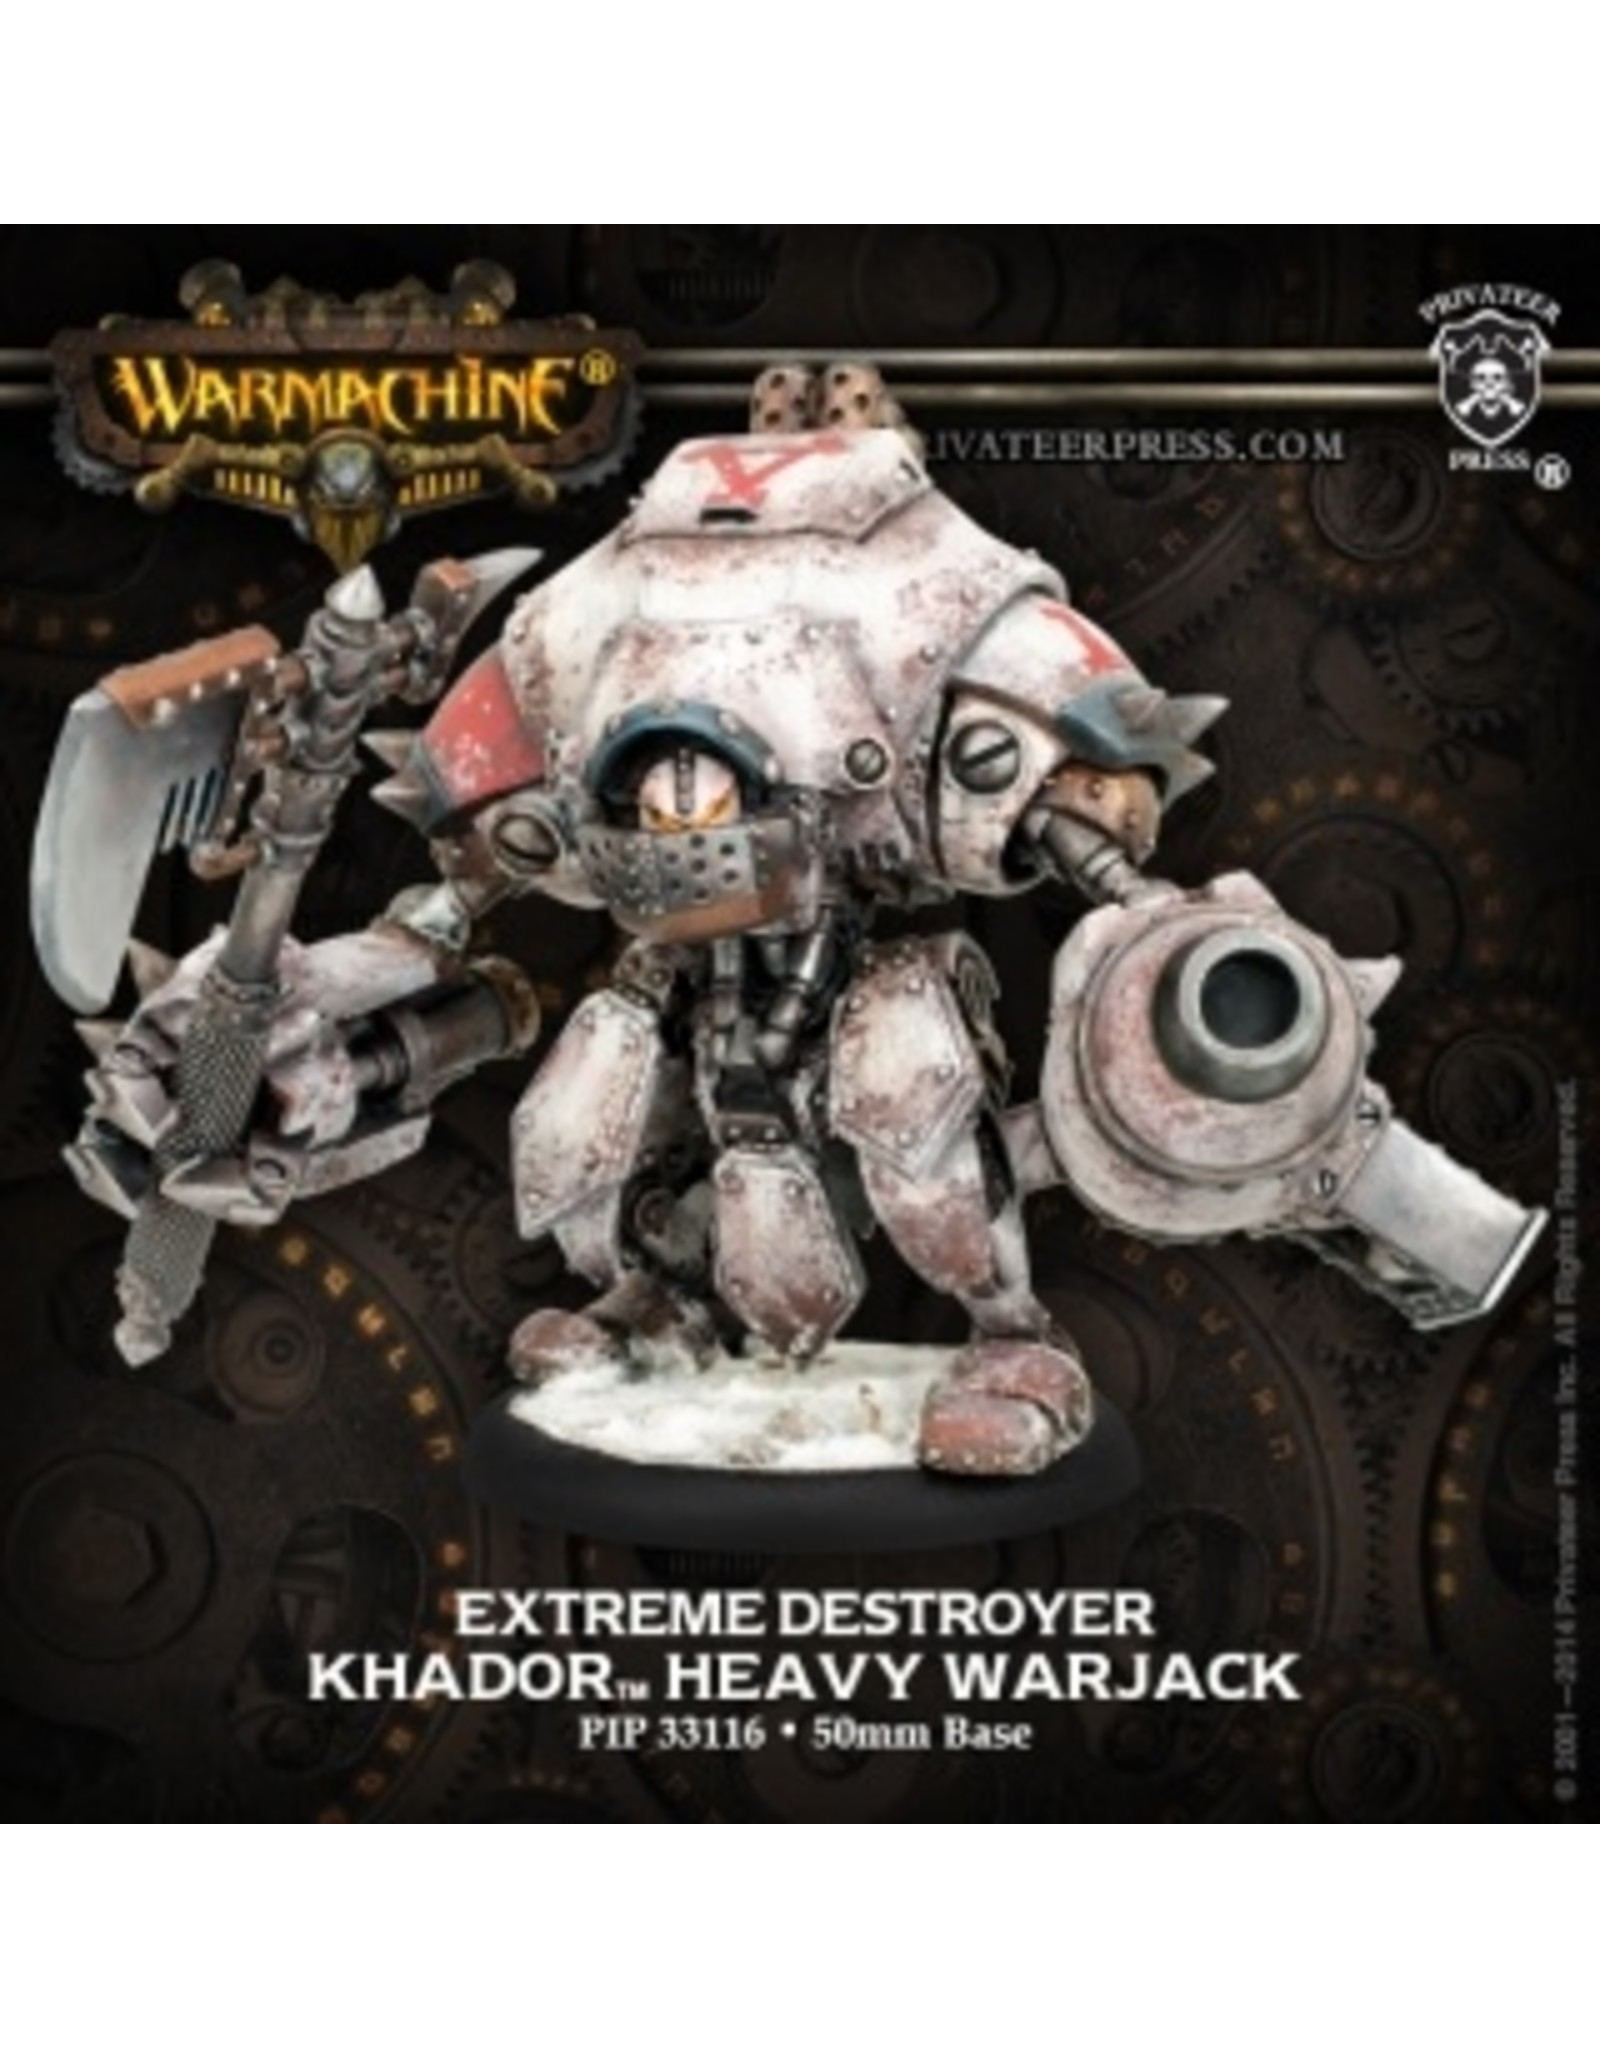 Warmachine: Khador Extreme Destroyer Warjack (Resin and White Metal)